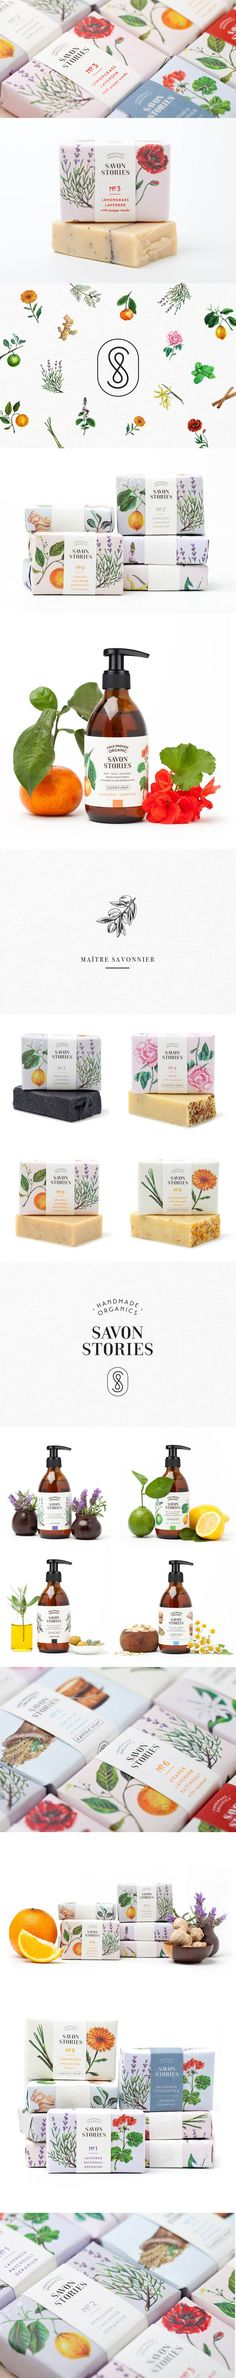 Savon Stories Packaging Design PD